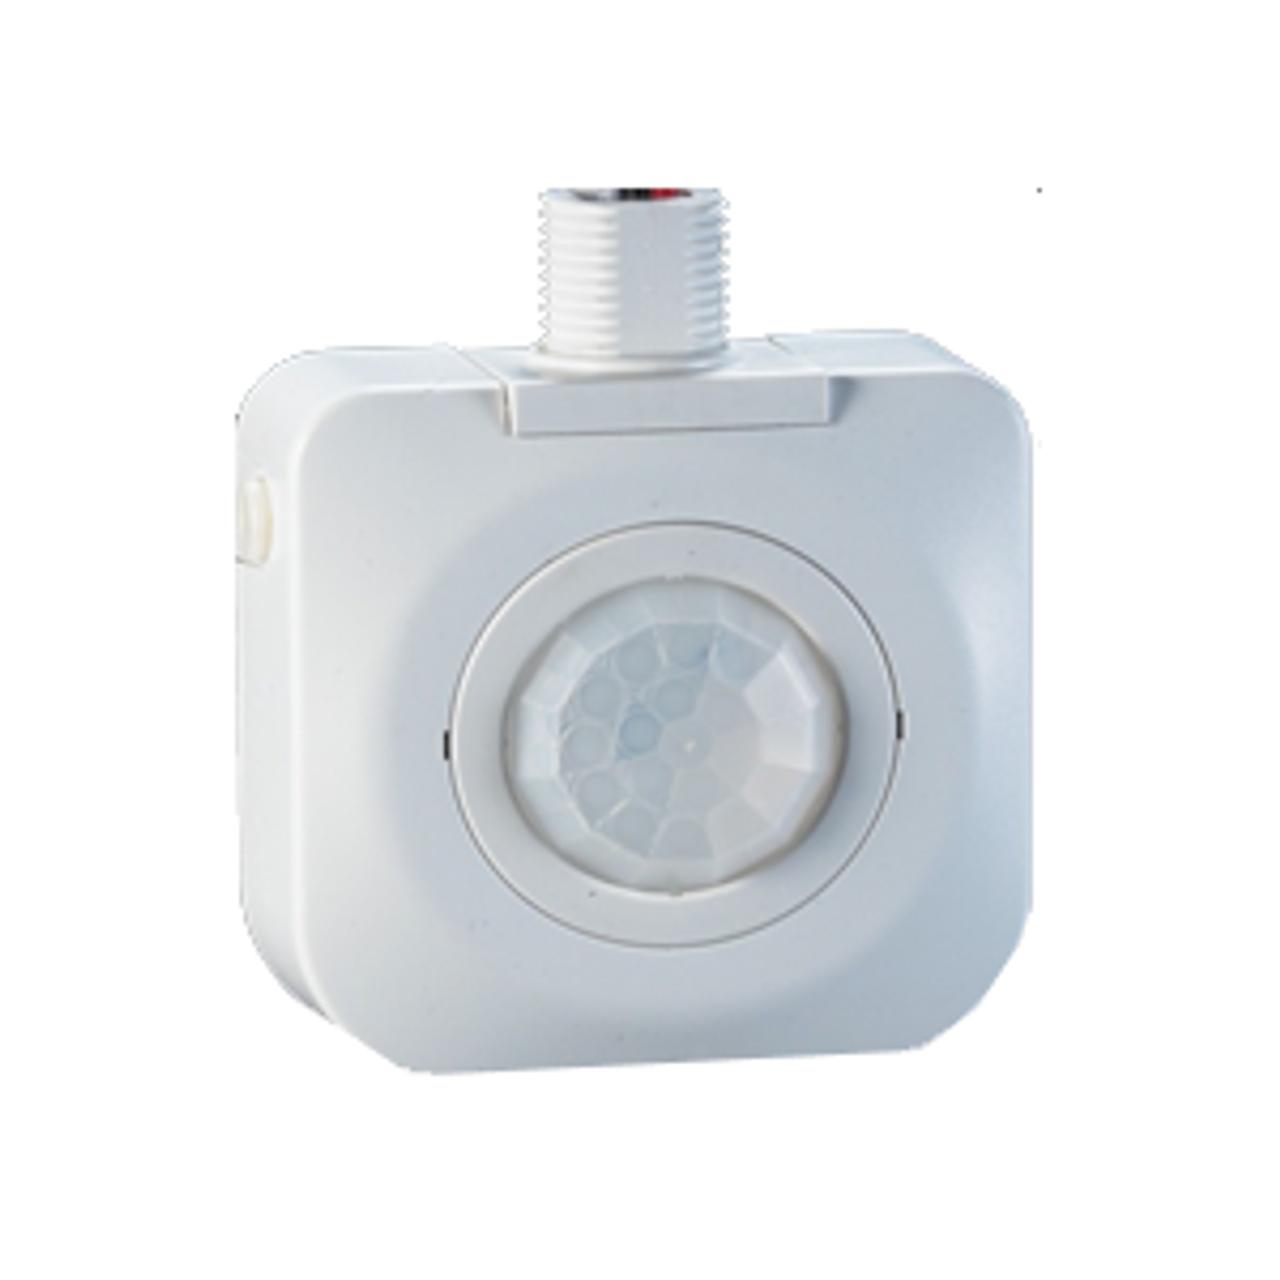 YM2501A Fixture Mount Occupancy Sensor Lighting Supply  1280 x 1280 png YM2501_Pic__98850.1496672359.png